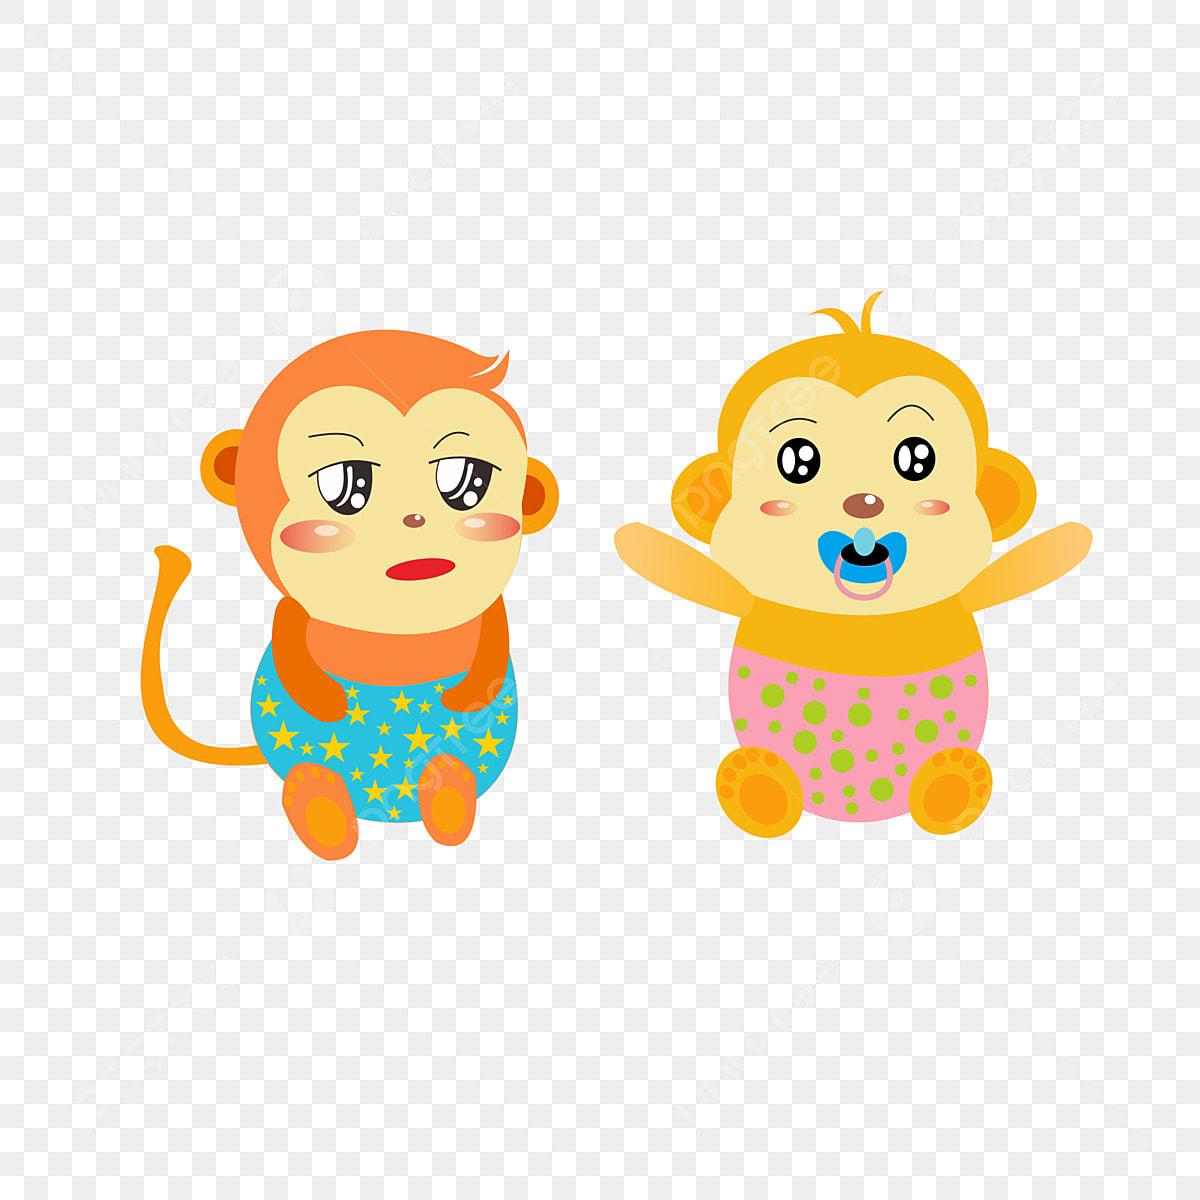 Animal Baby Elements Cartoon Bebe Fofo Macaco Irmaos Animal